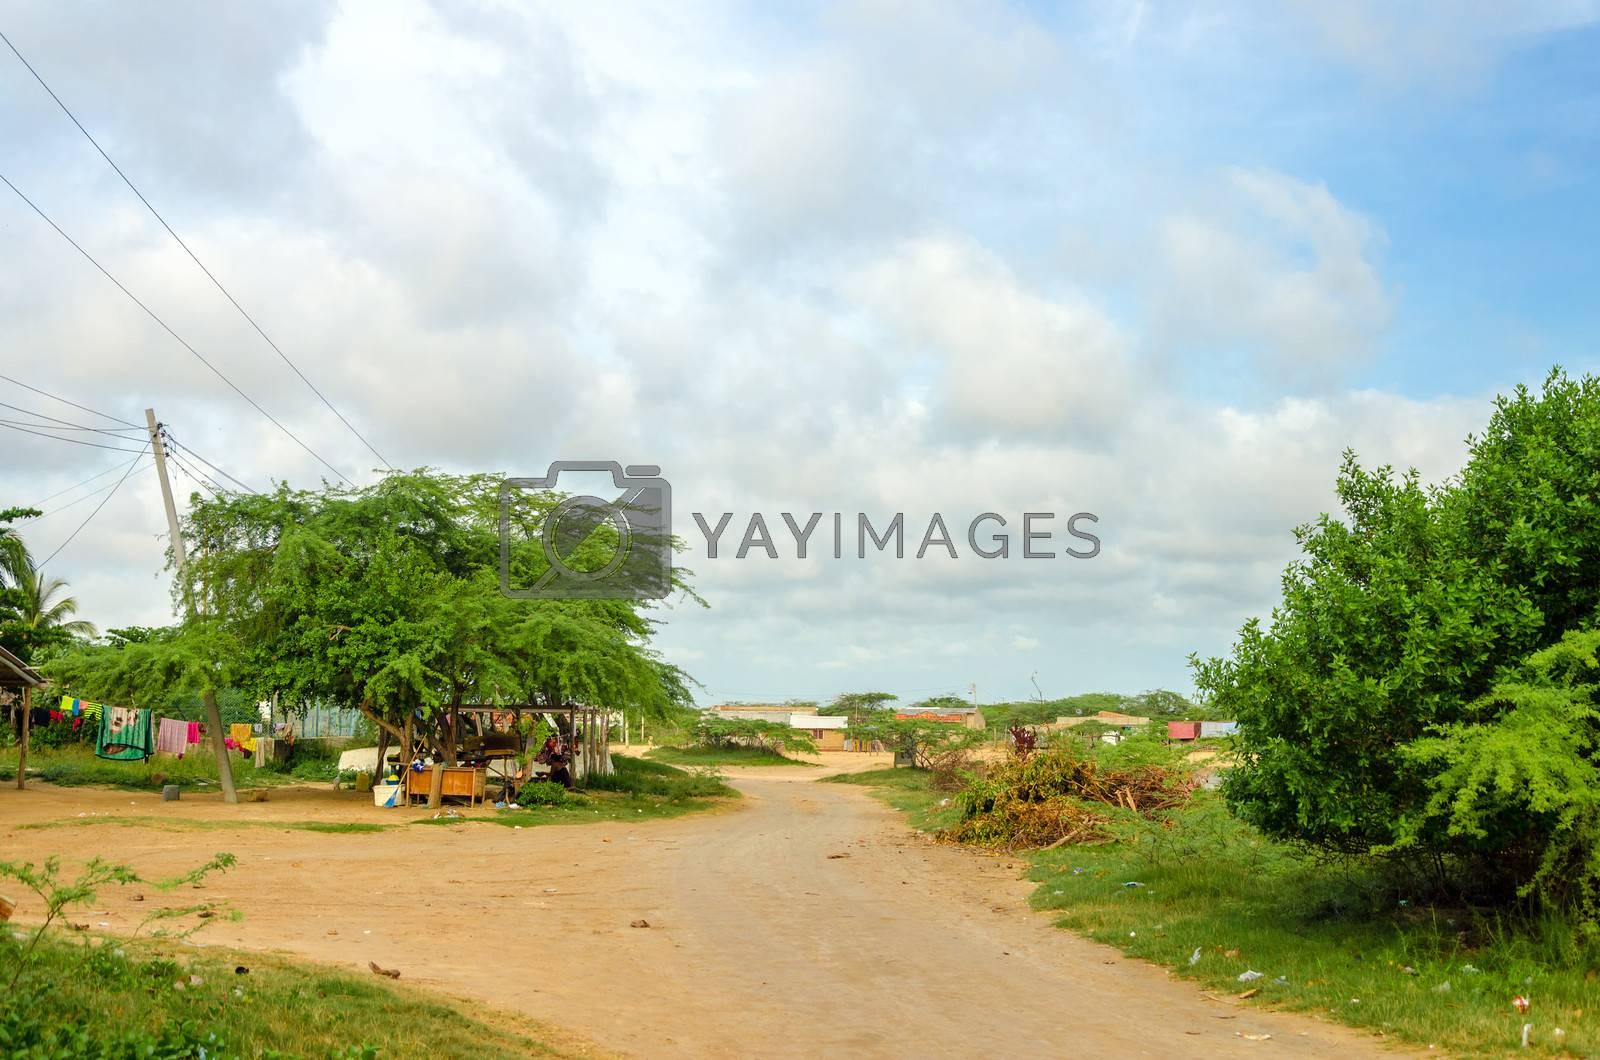 Dirt road passing through a rural village in La Guajira, Colombia